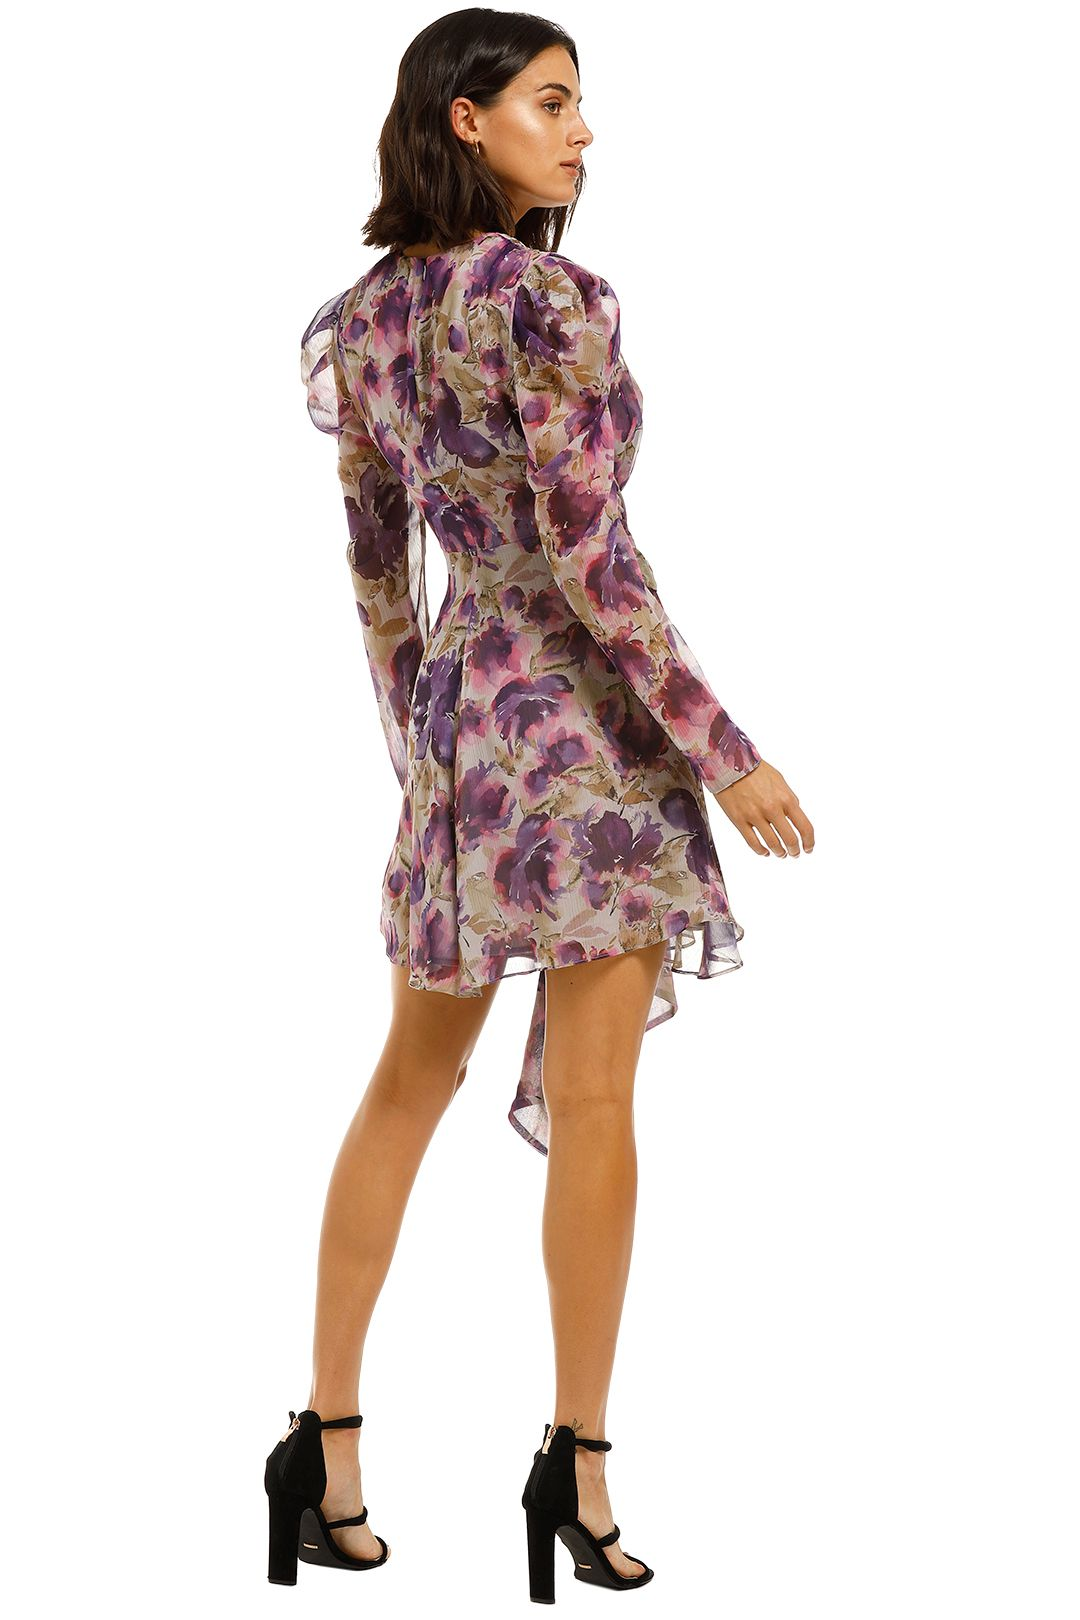 Misha-Nikita-Dress-Floral-Back